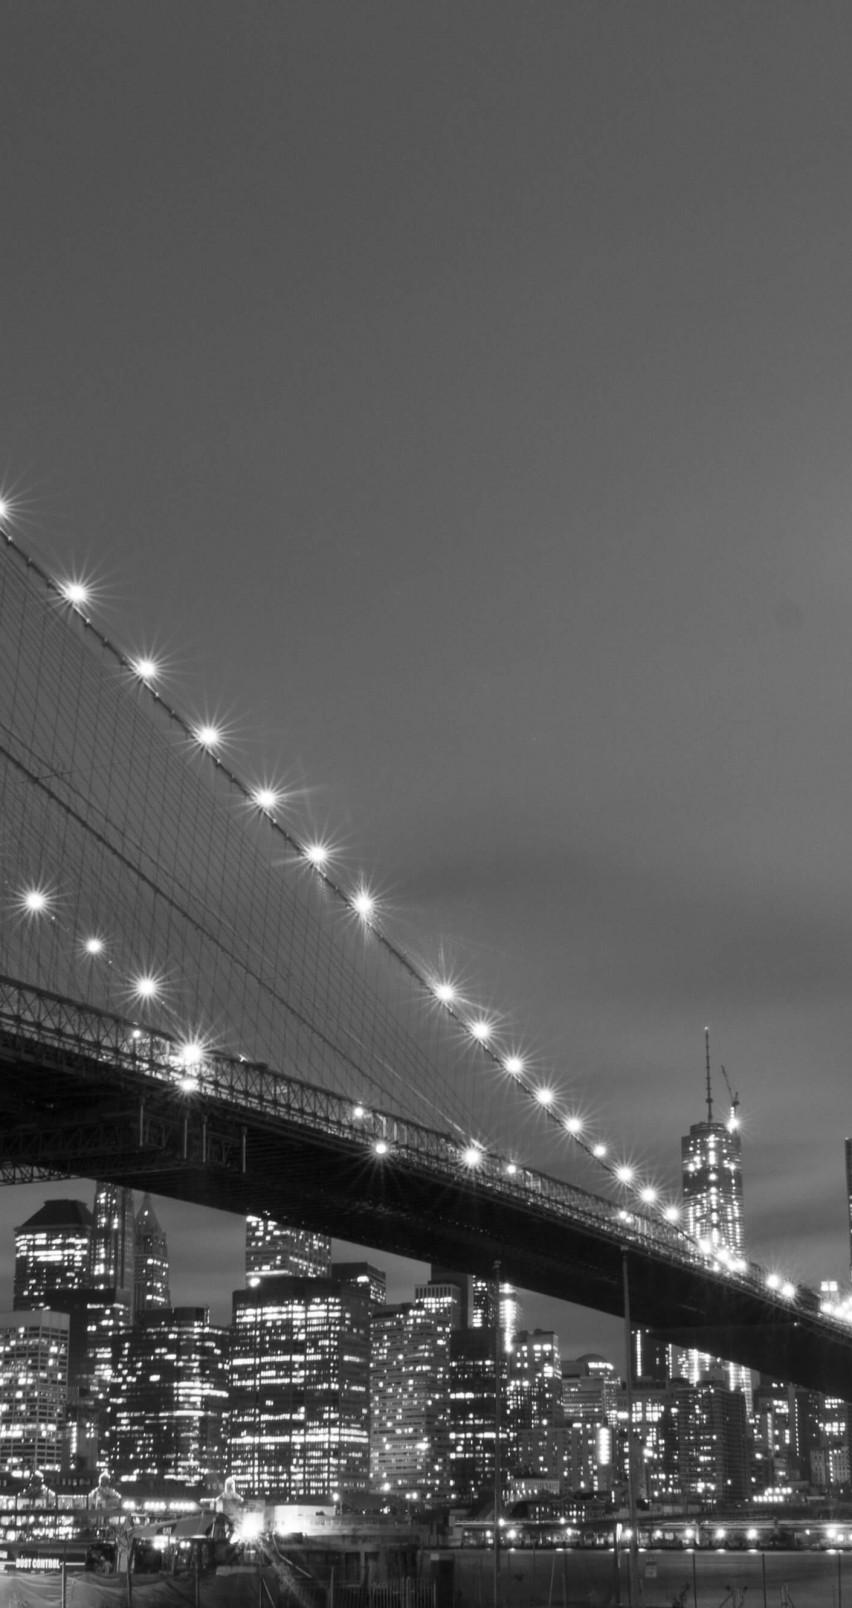 Iphone 6 New York City Wallpaper Brooklyn Bridge New York City In